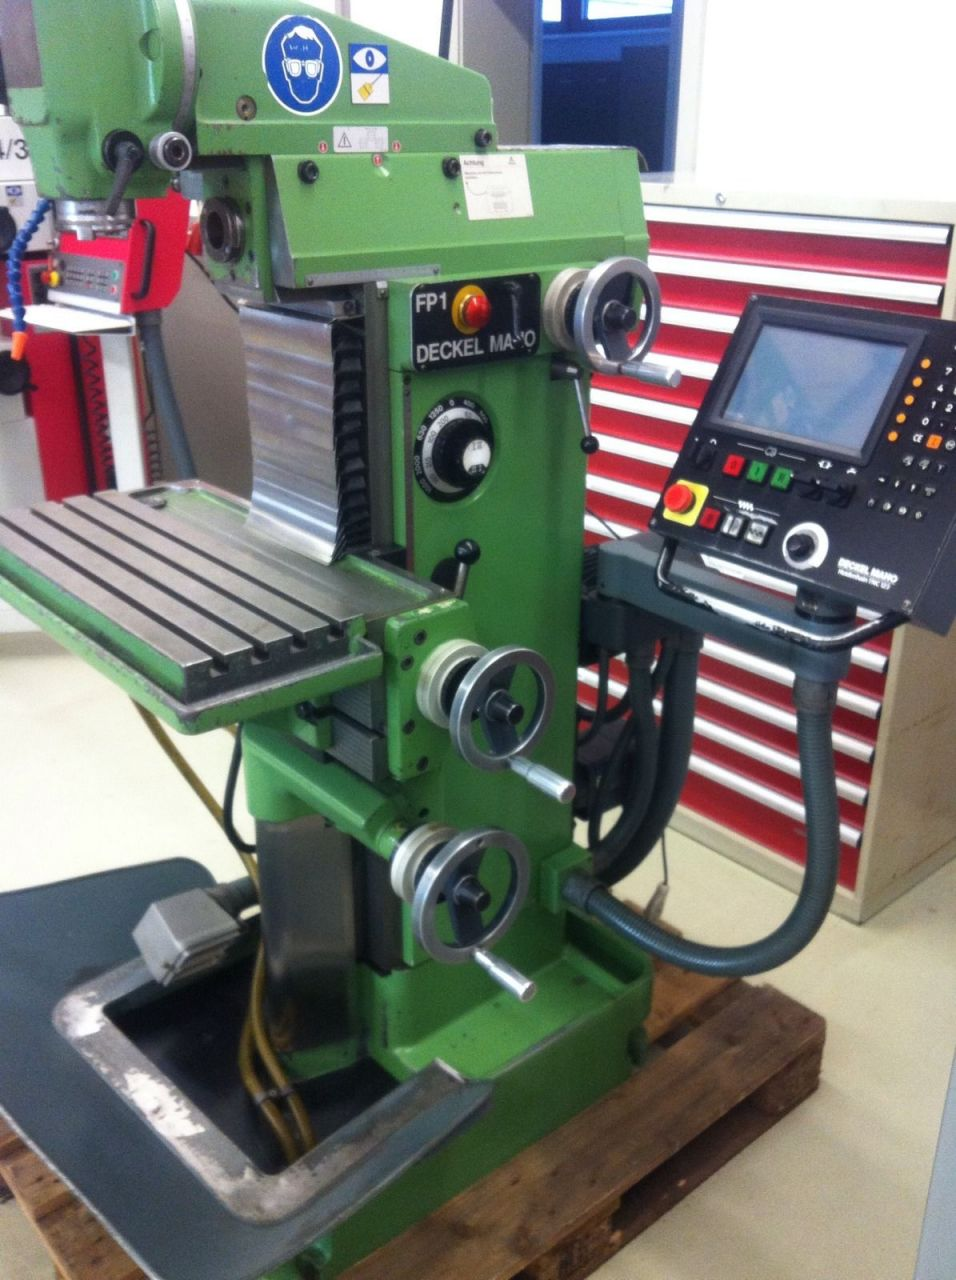 CNC Milling Machine DECKEL FP 1